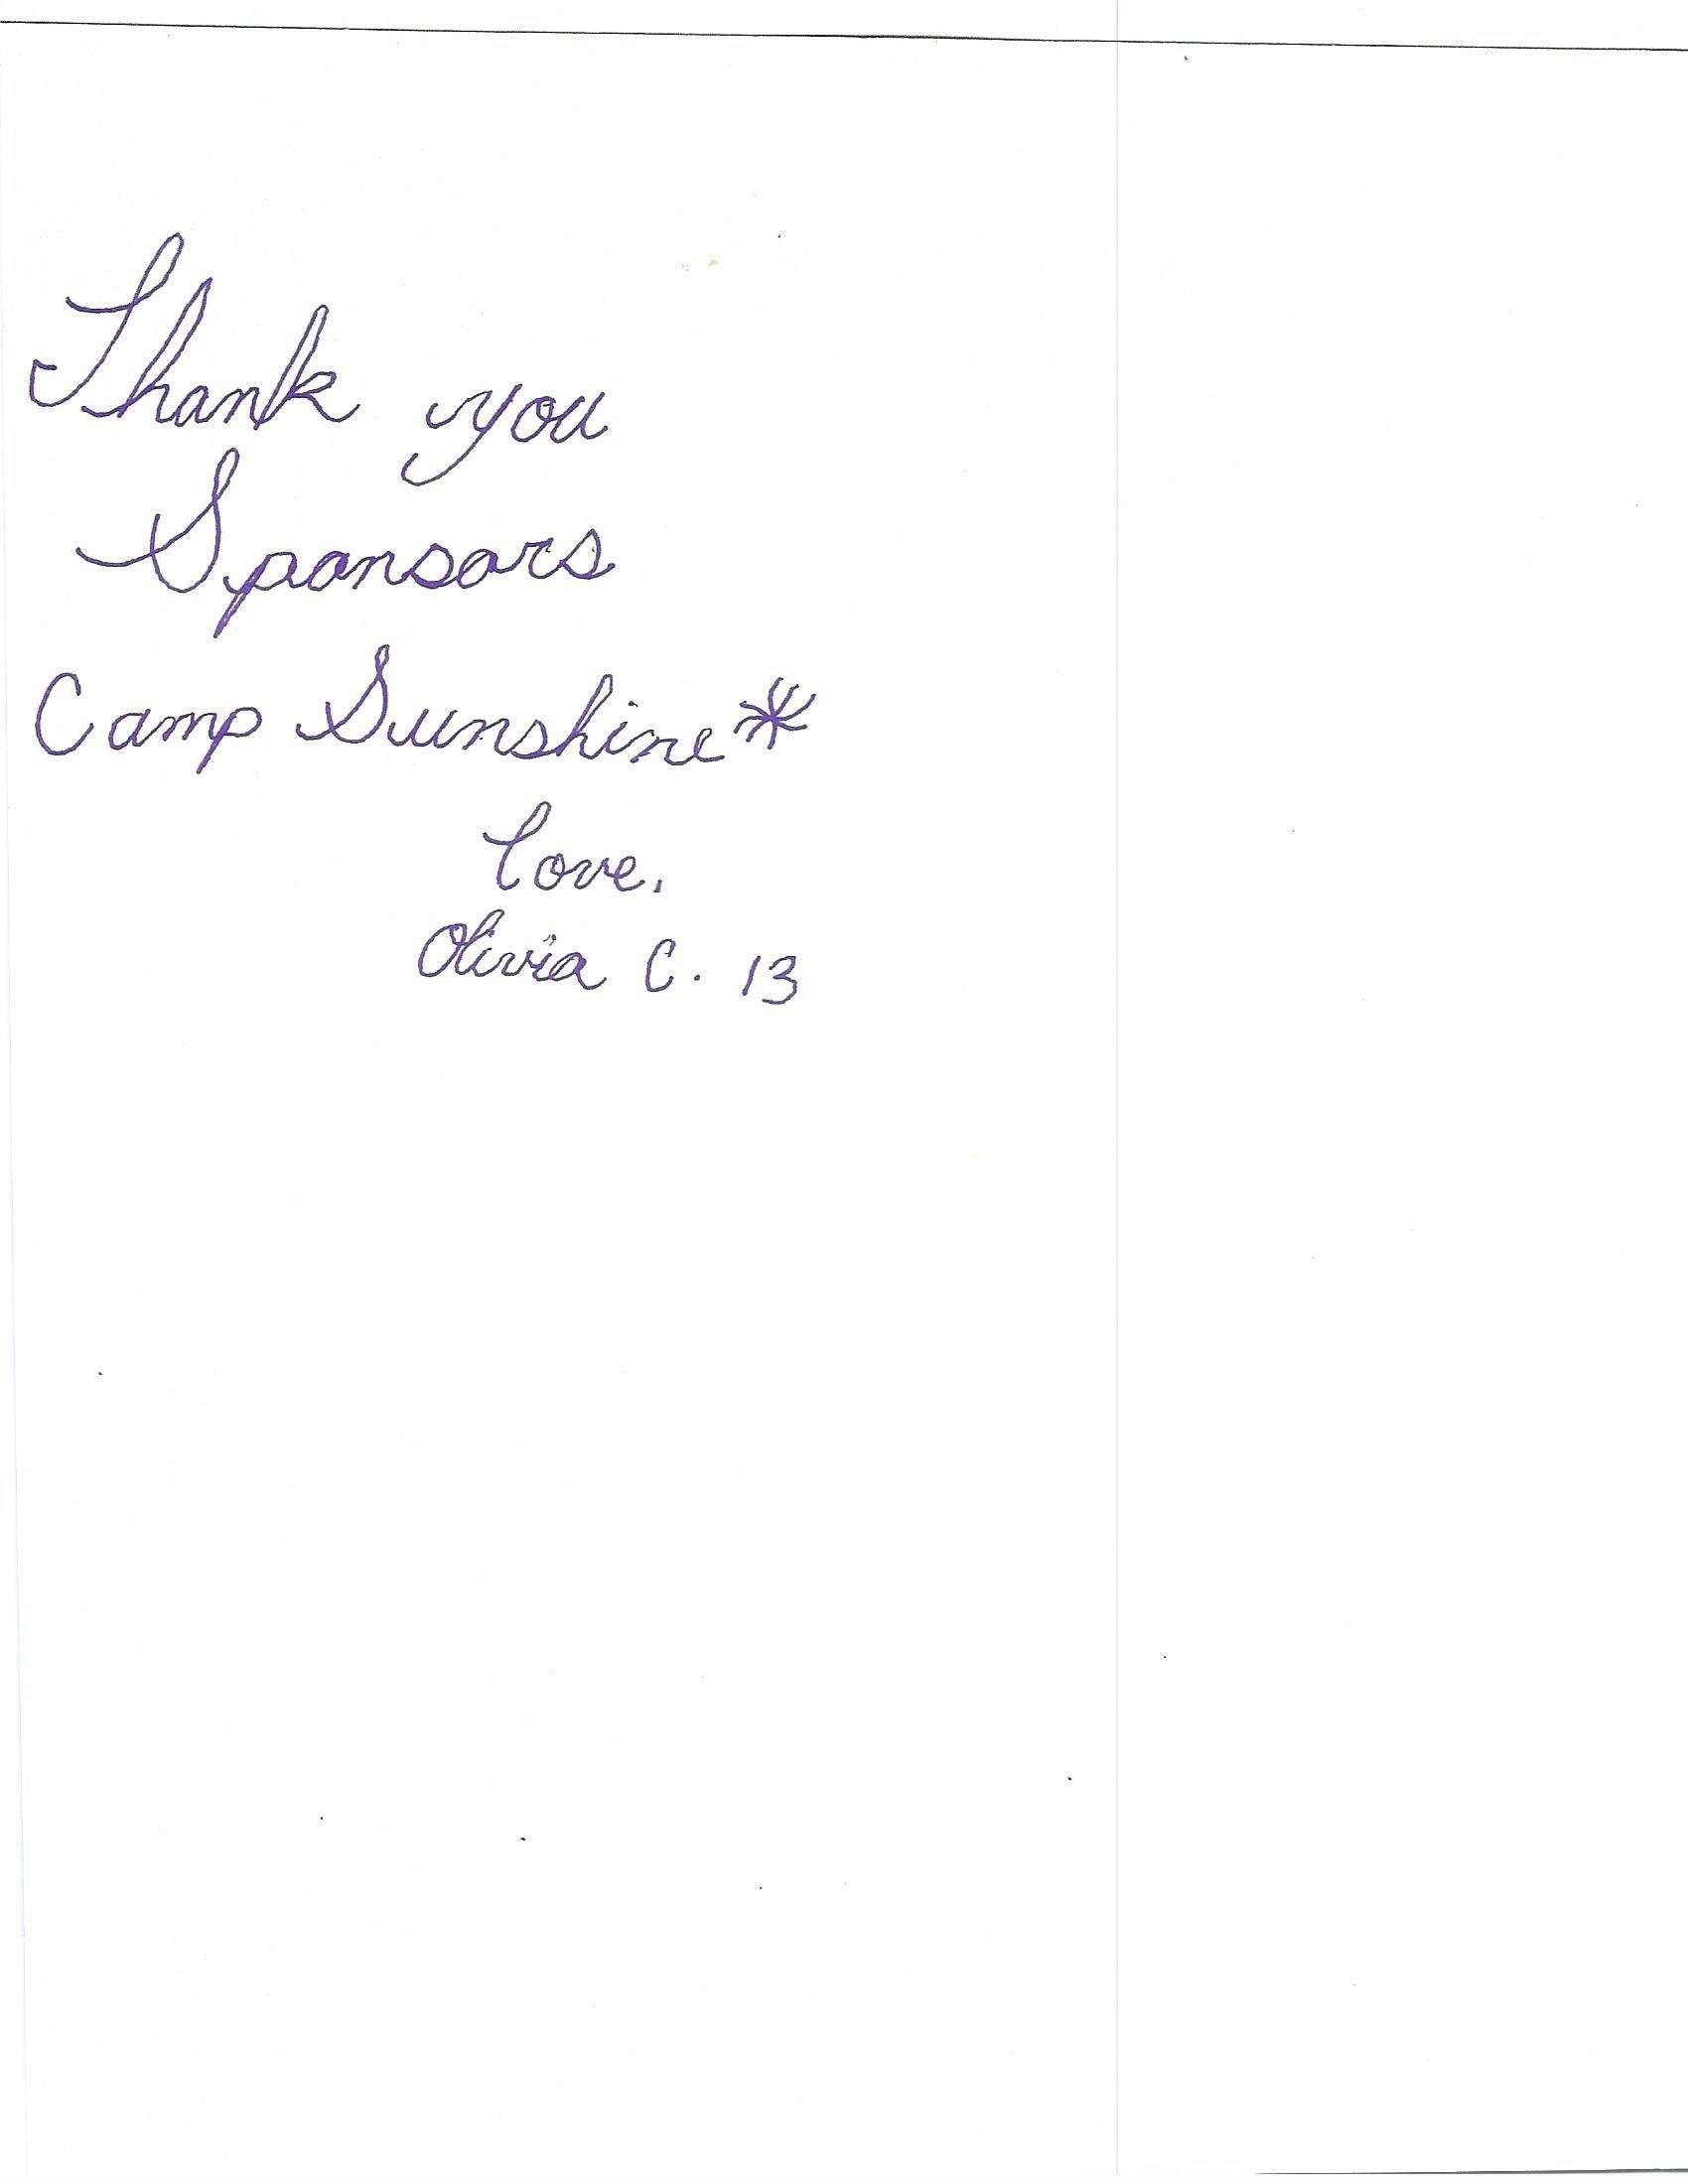 MJD Camp Sunshine client TY letter_Page_3.jpg